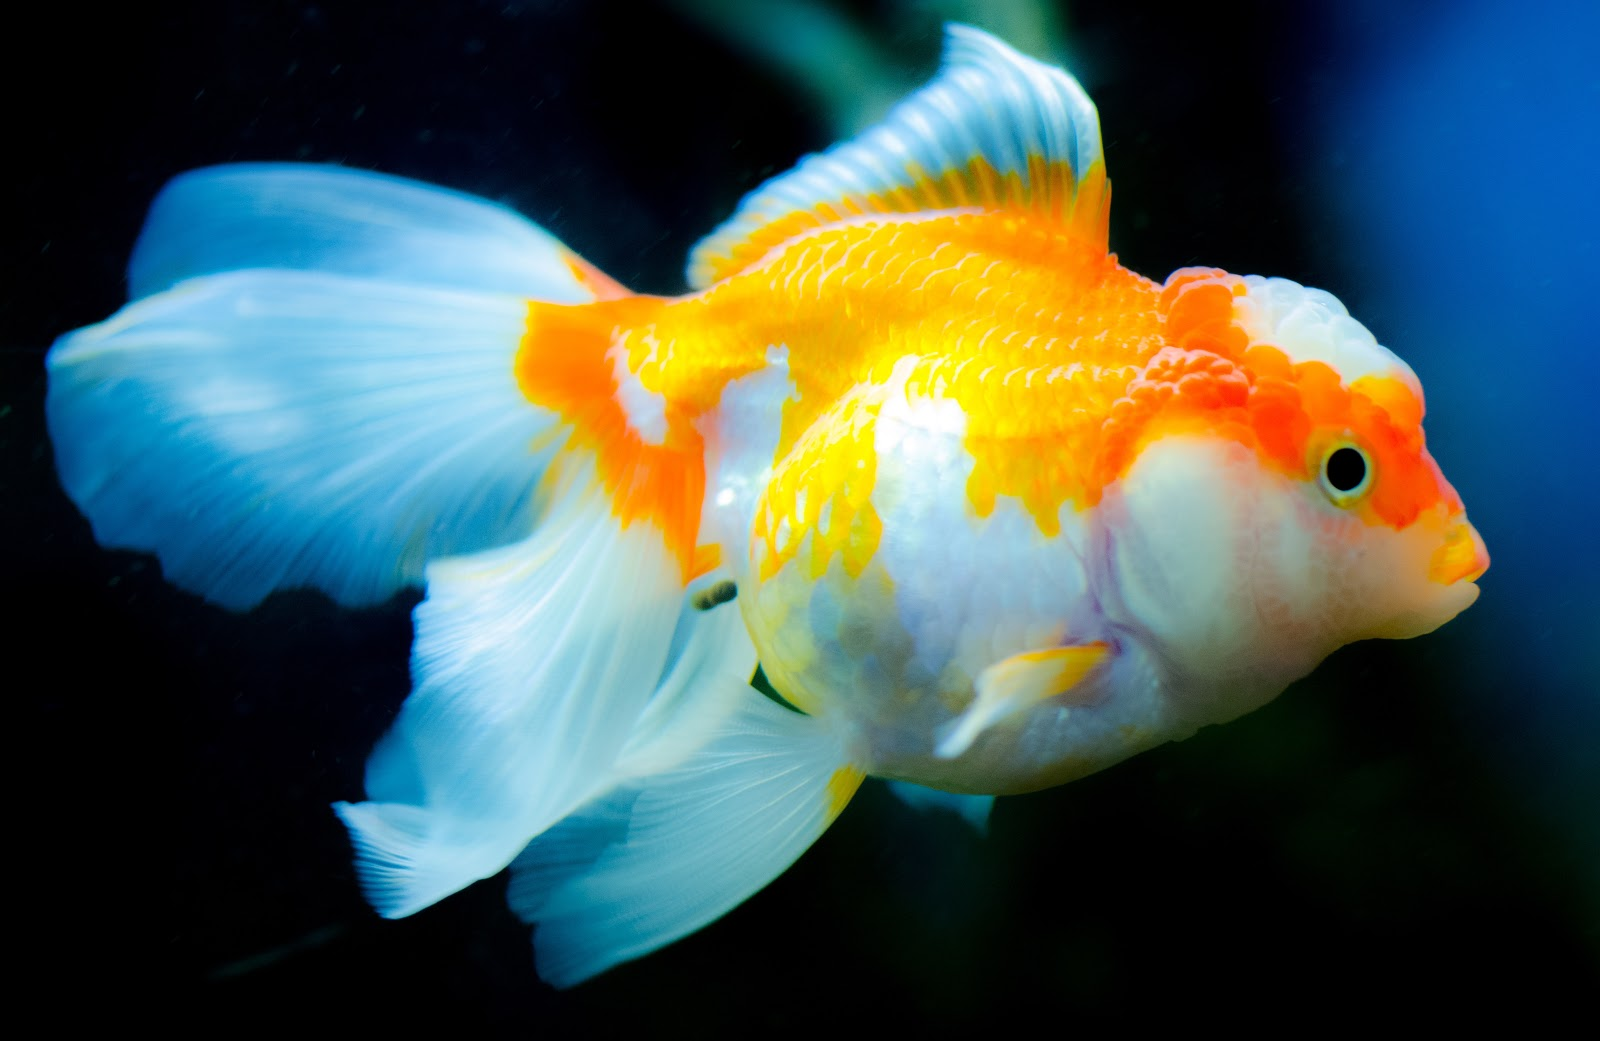 orange-and-white-fish-images